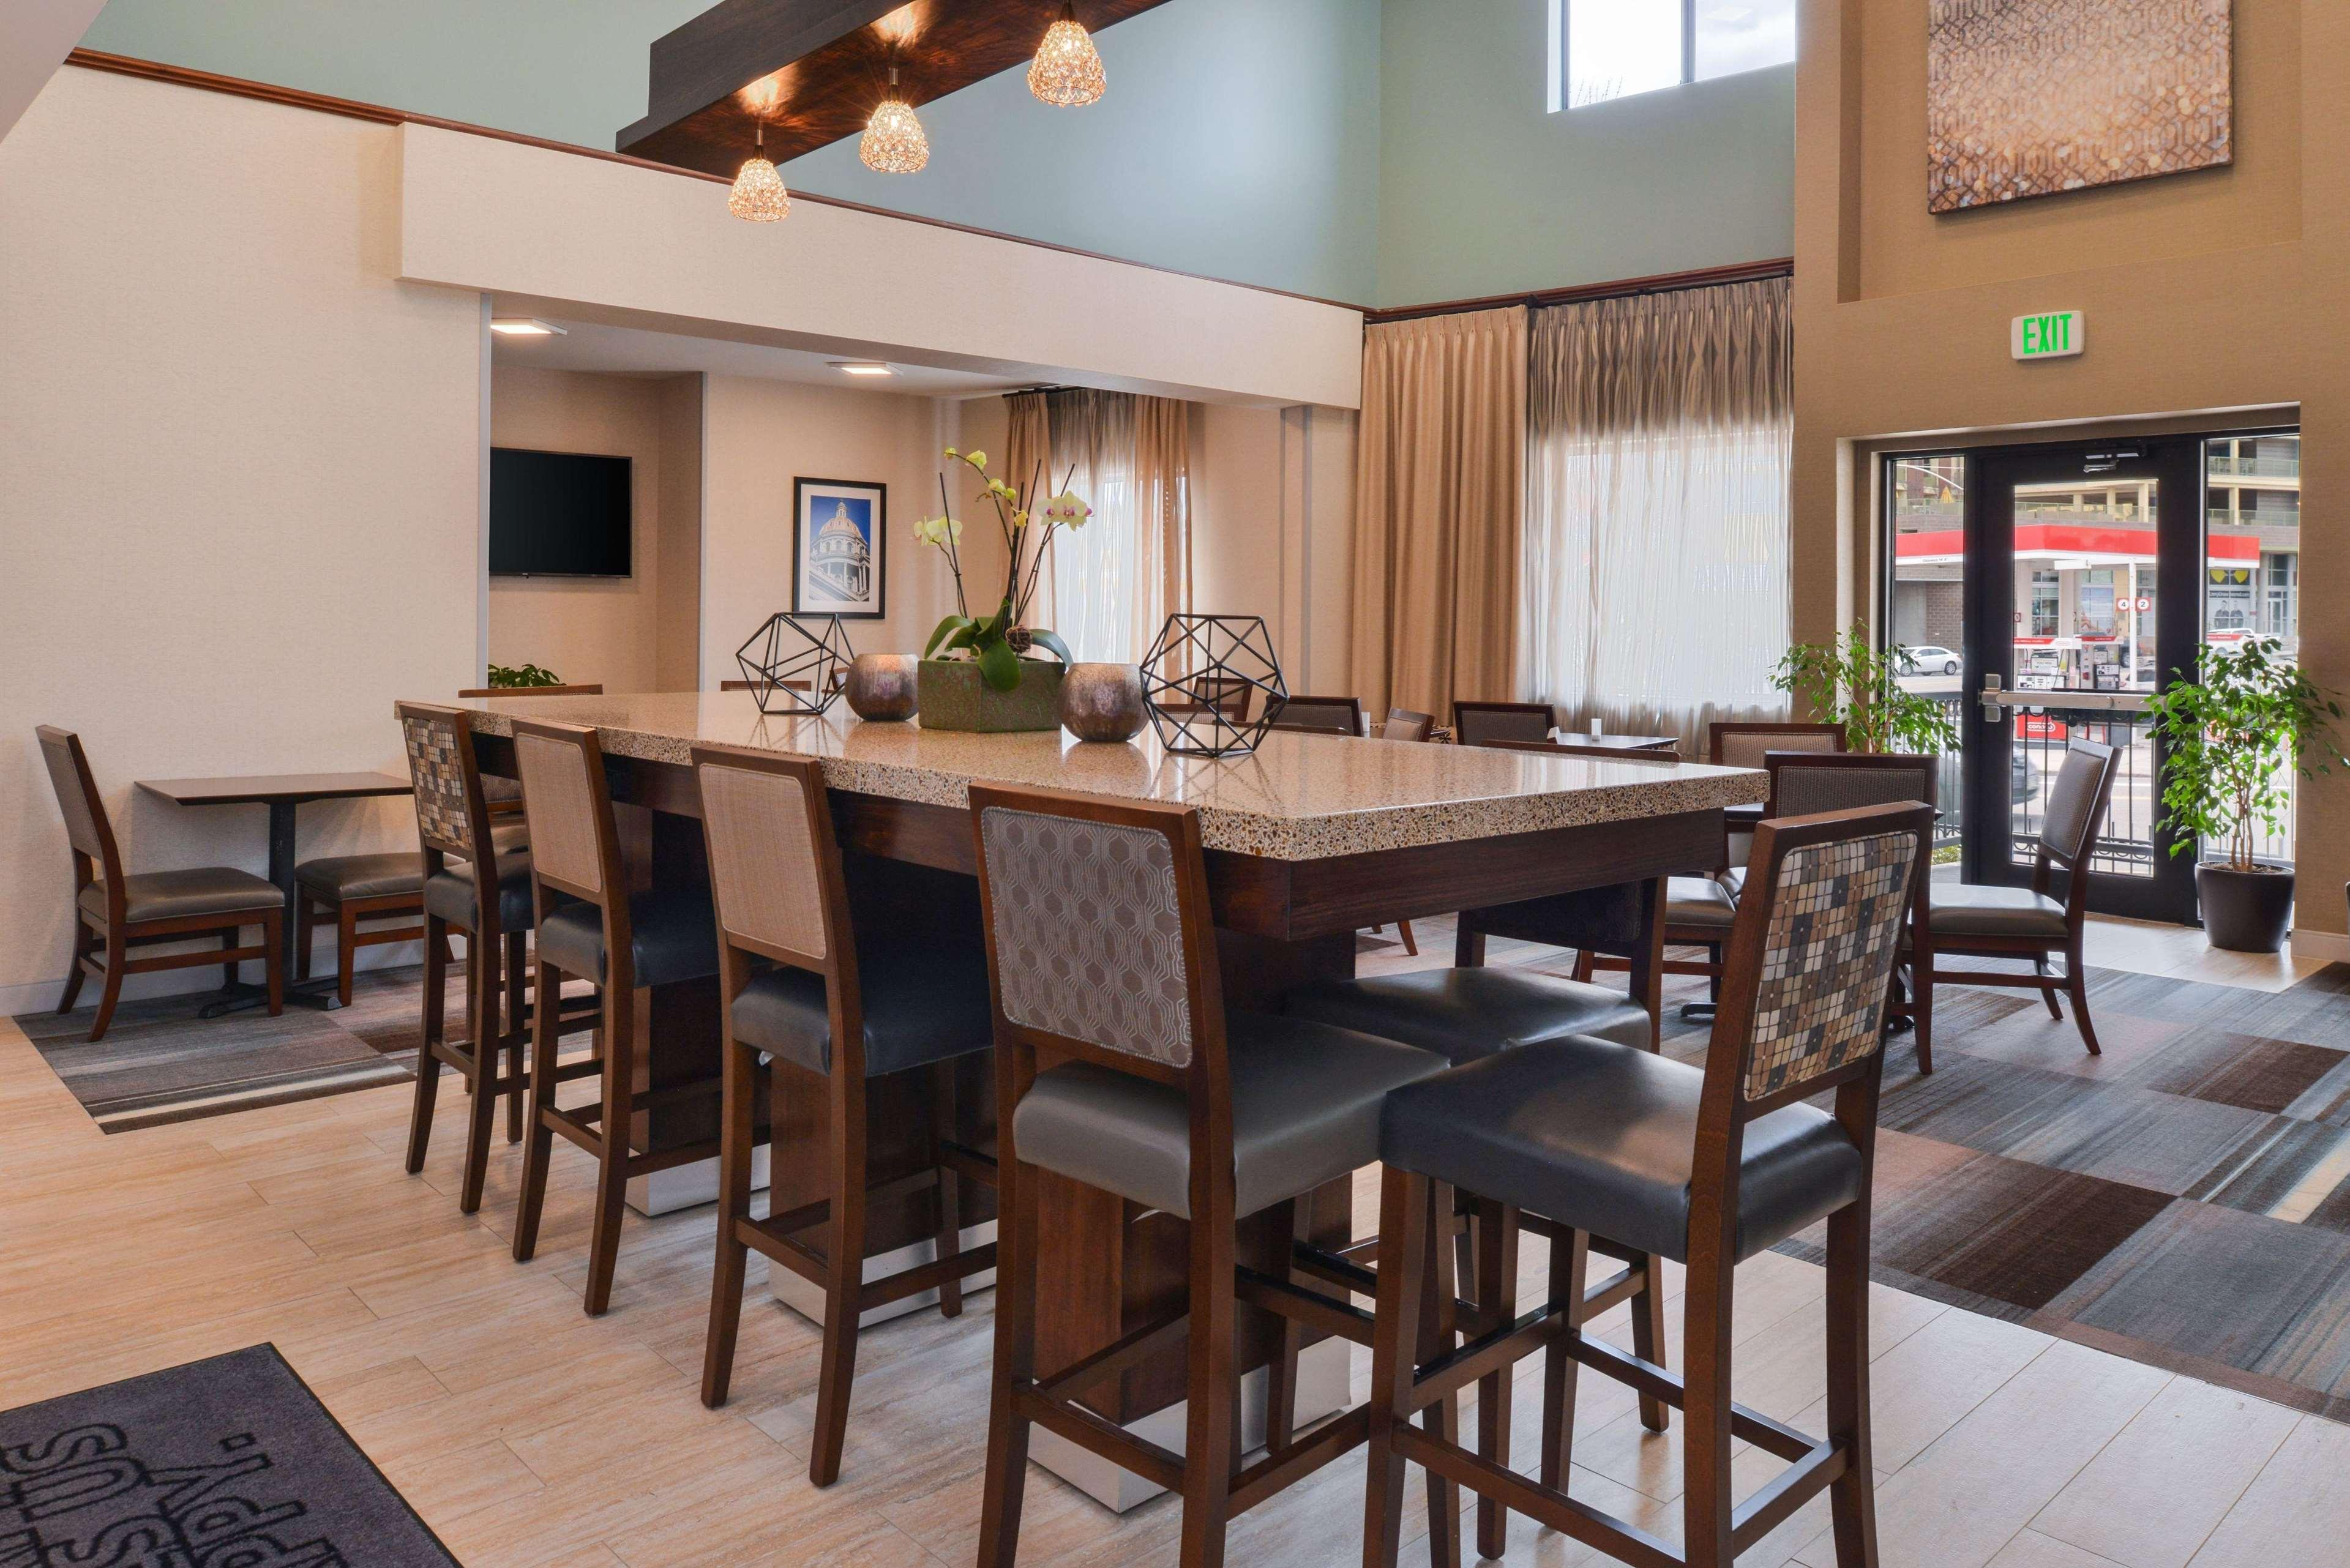 Hampton Inn & Suites Denver-Speer Boulevard image 45